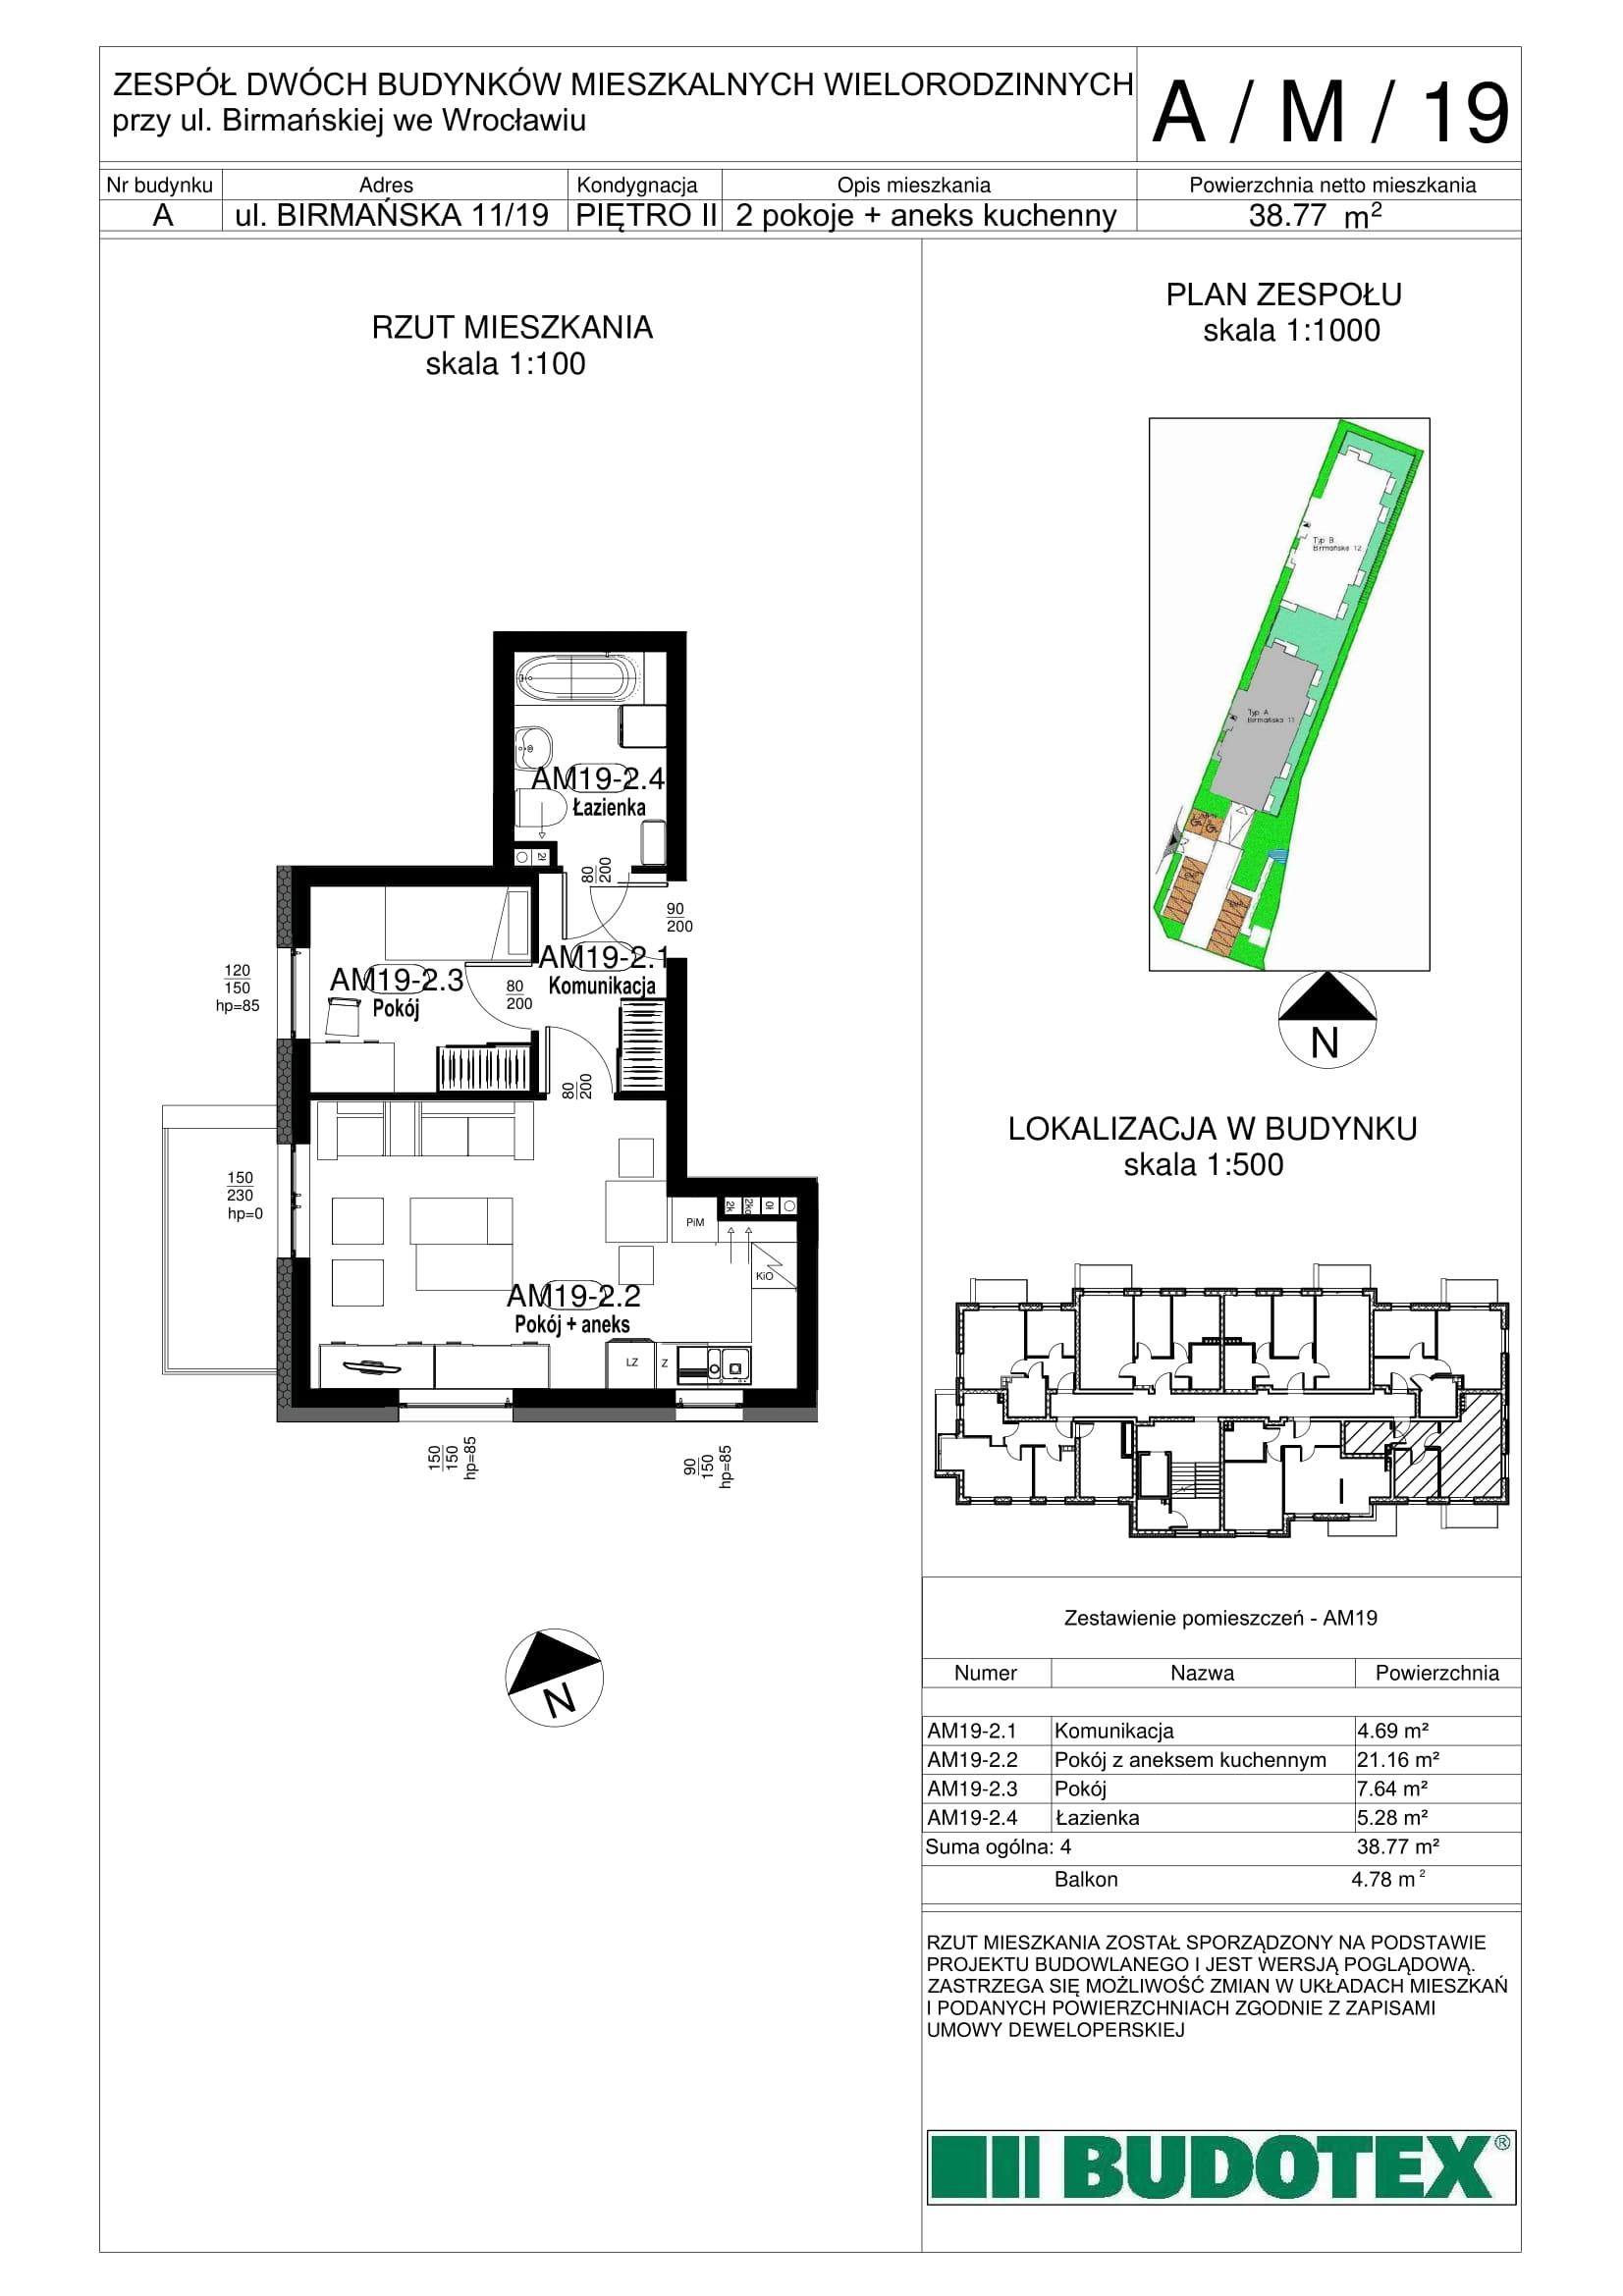 Mieszkanie nr A/M/19